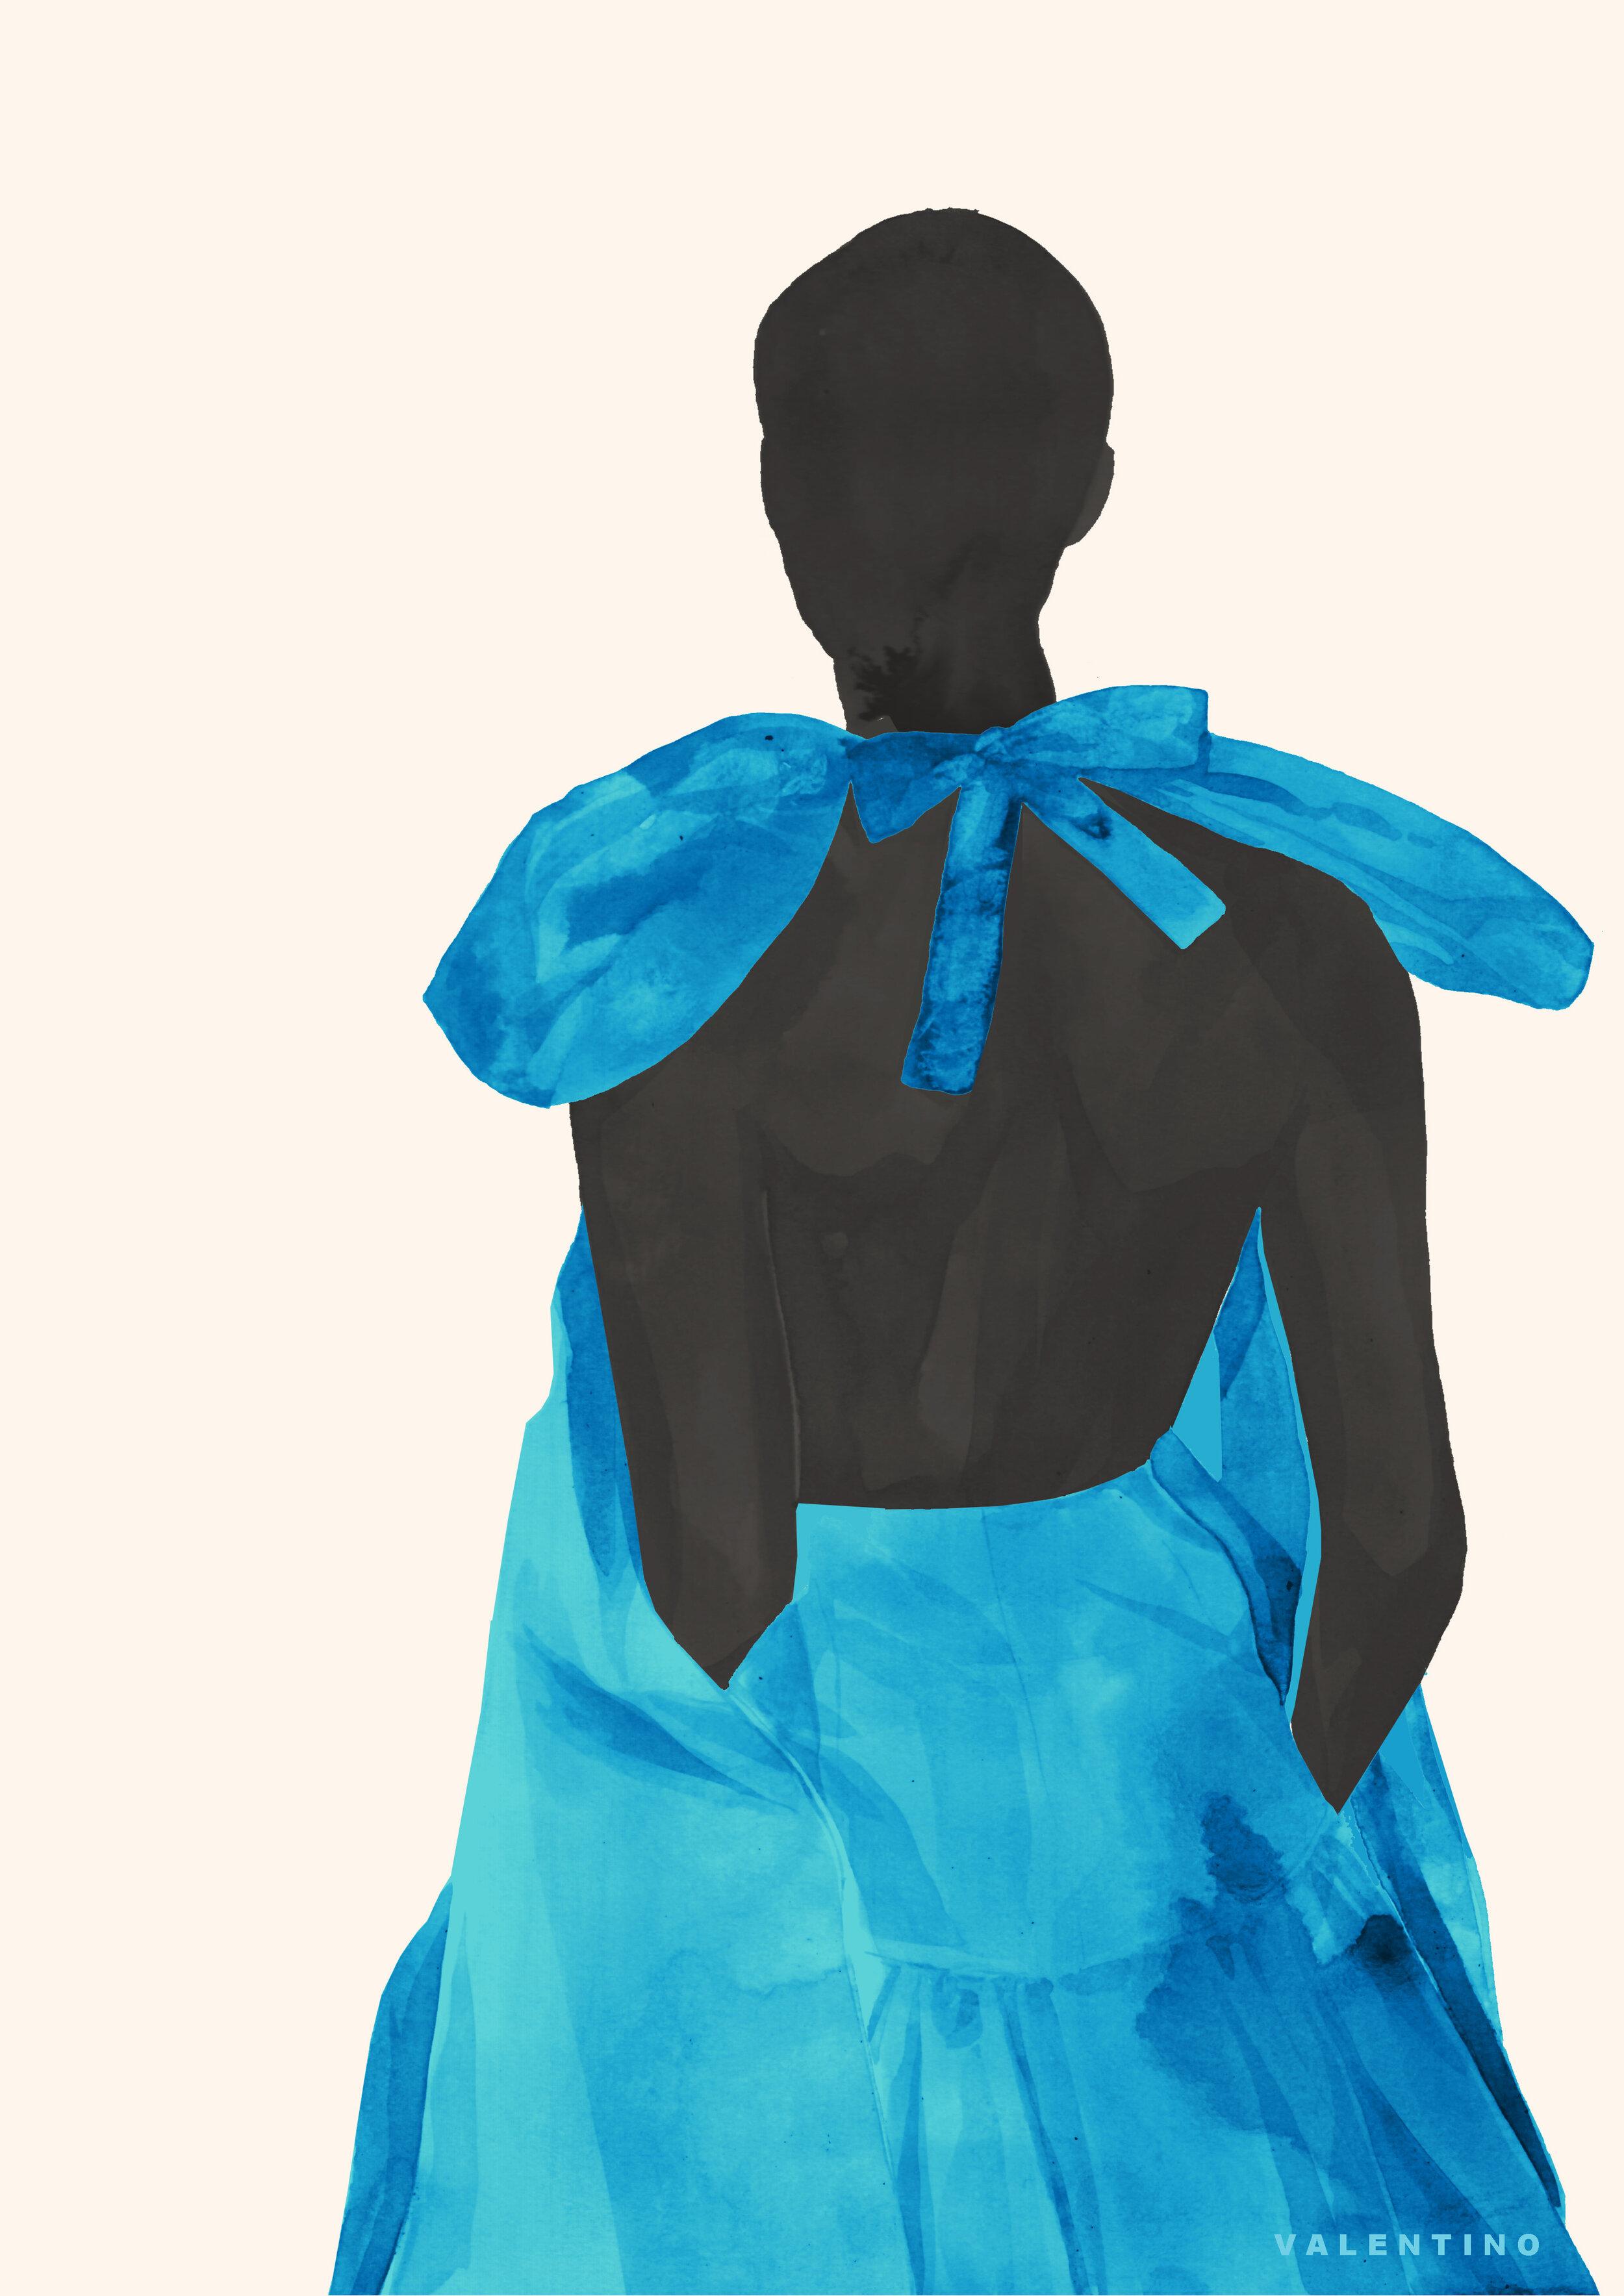 joannalayla_valentino_dress_A3.jpg